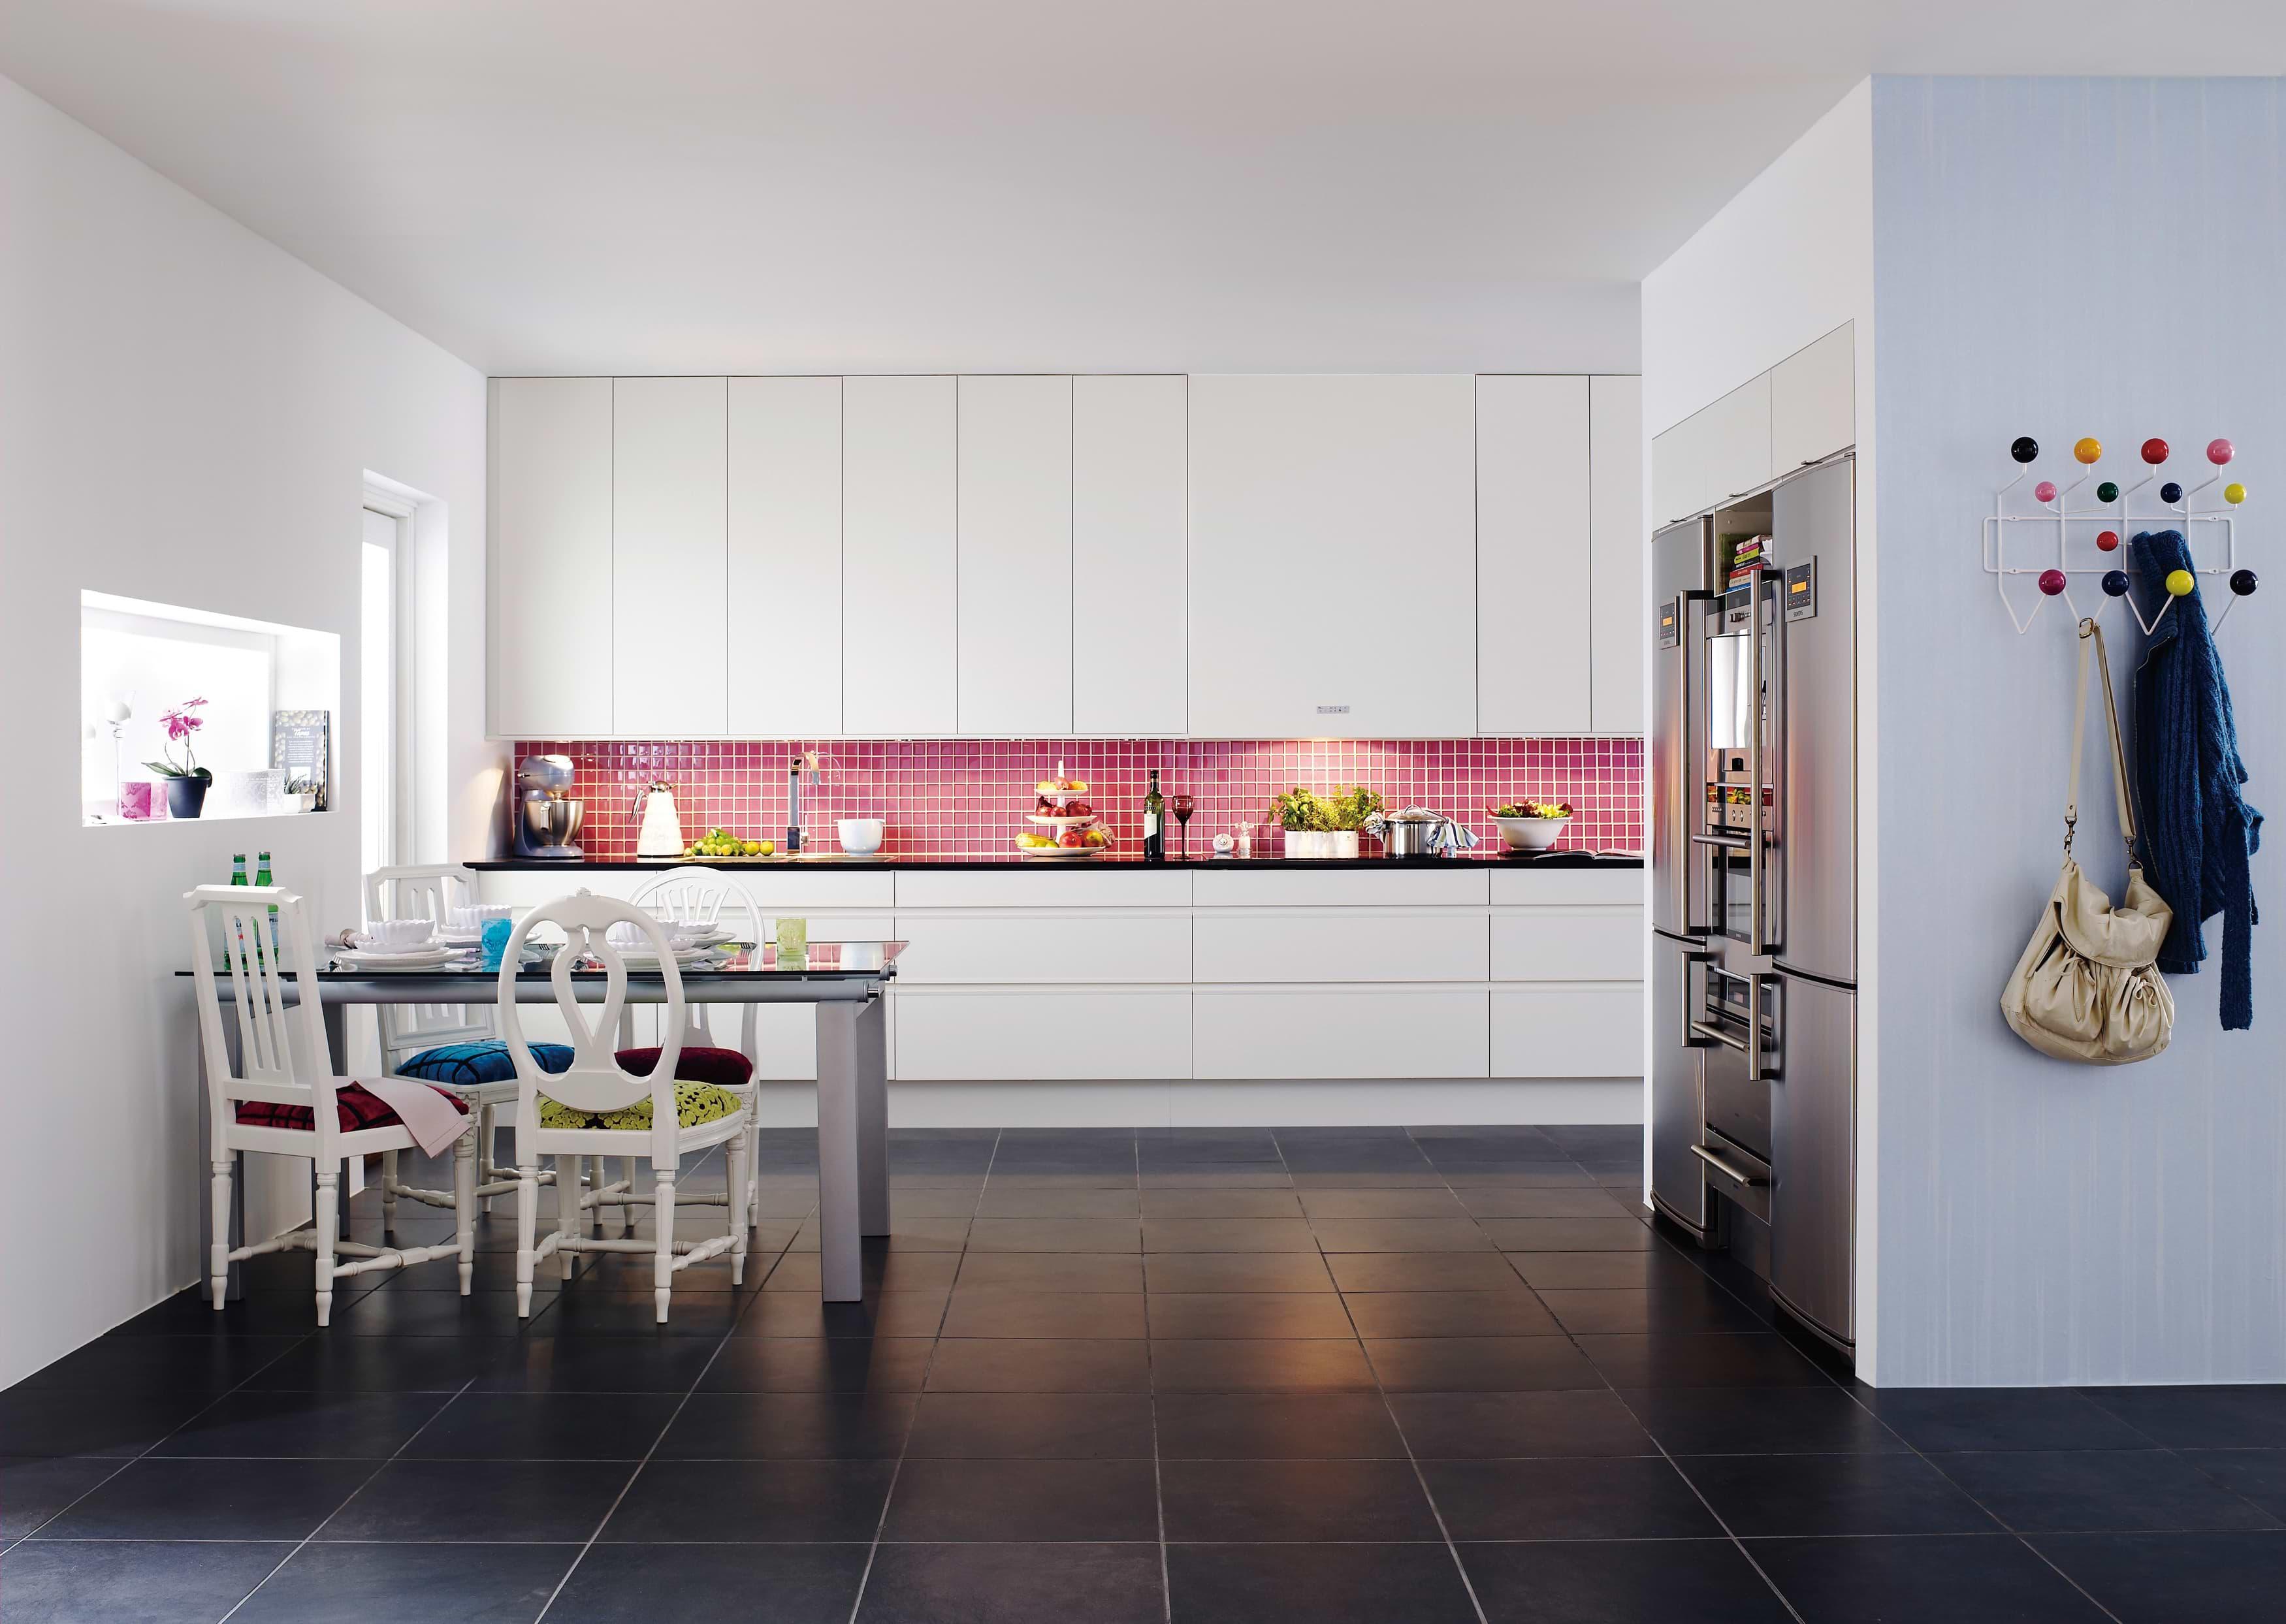 200 Kitchen Design Ideas For Re Modelling Kenyan Homes In 2020 Kitchen Design Kitchen Cabinet Design Simple Kitchen Design